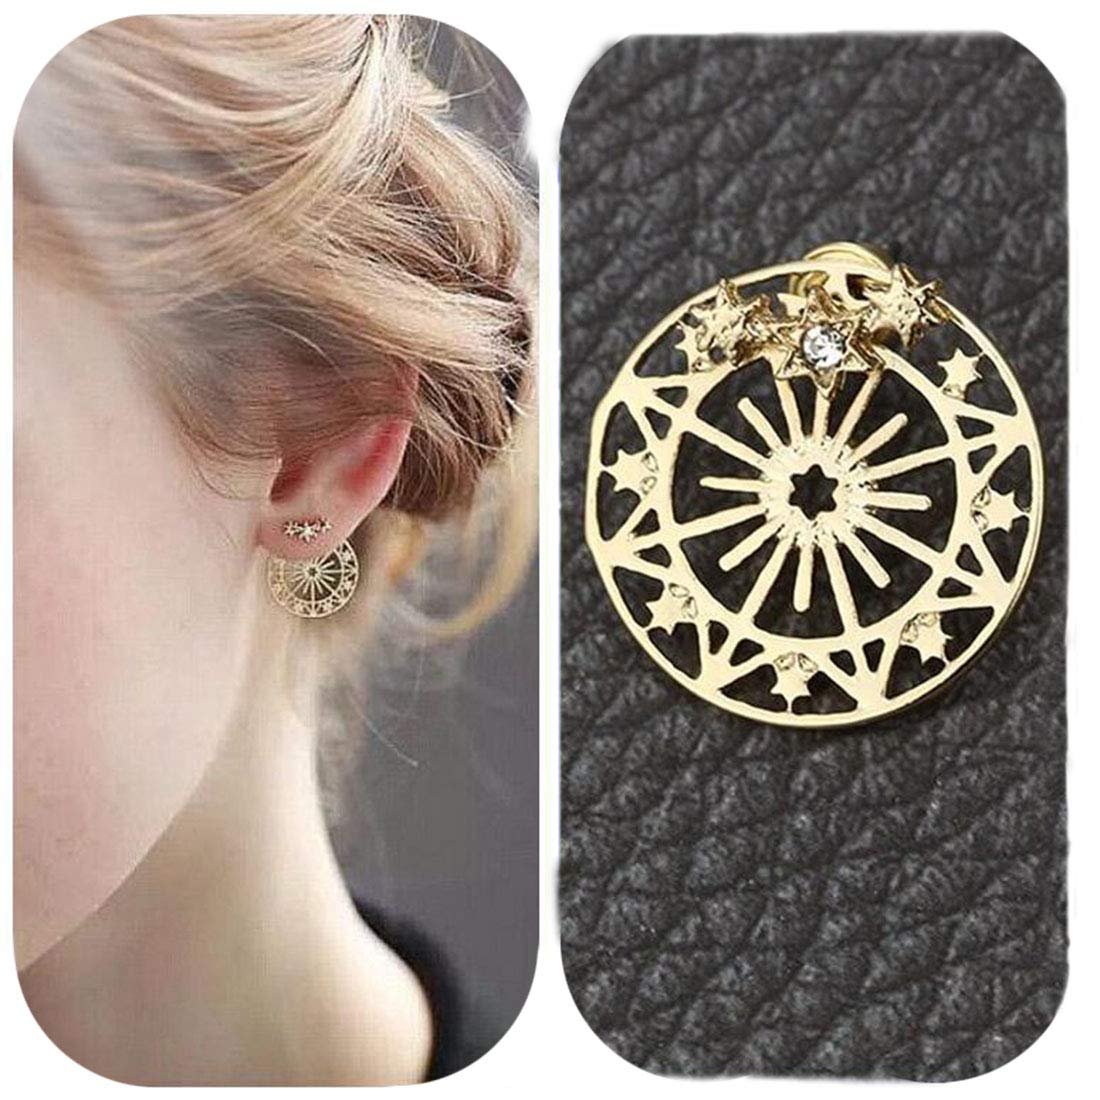 Eoumy Women Star Sun Ear Jacket Earrings for Women Hollow Out Round Constellation Dangle Crystal Star Stud Earrings